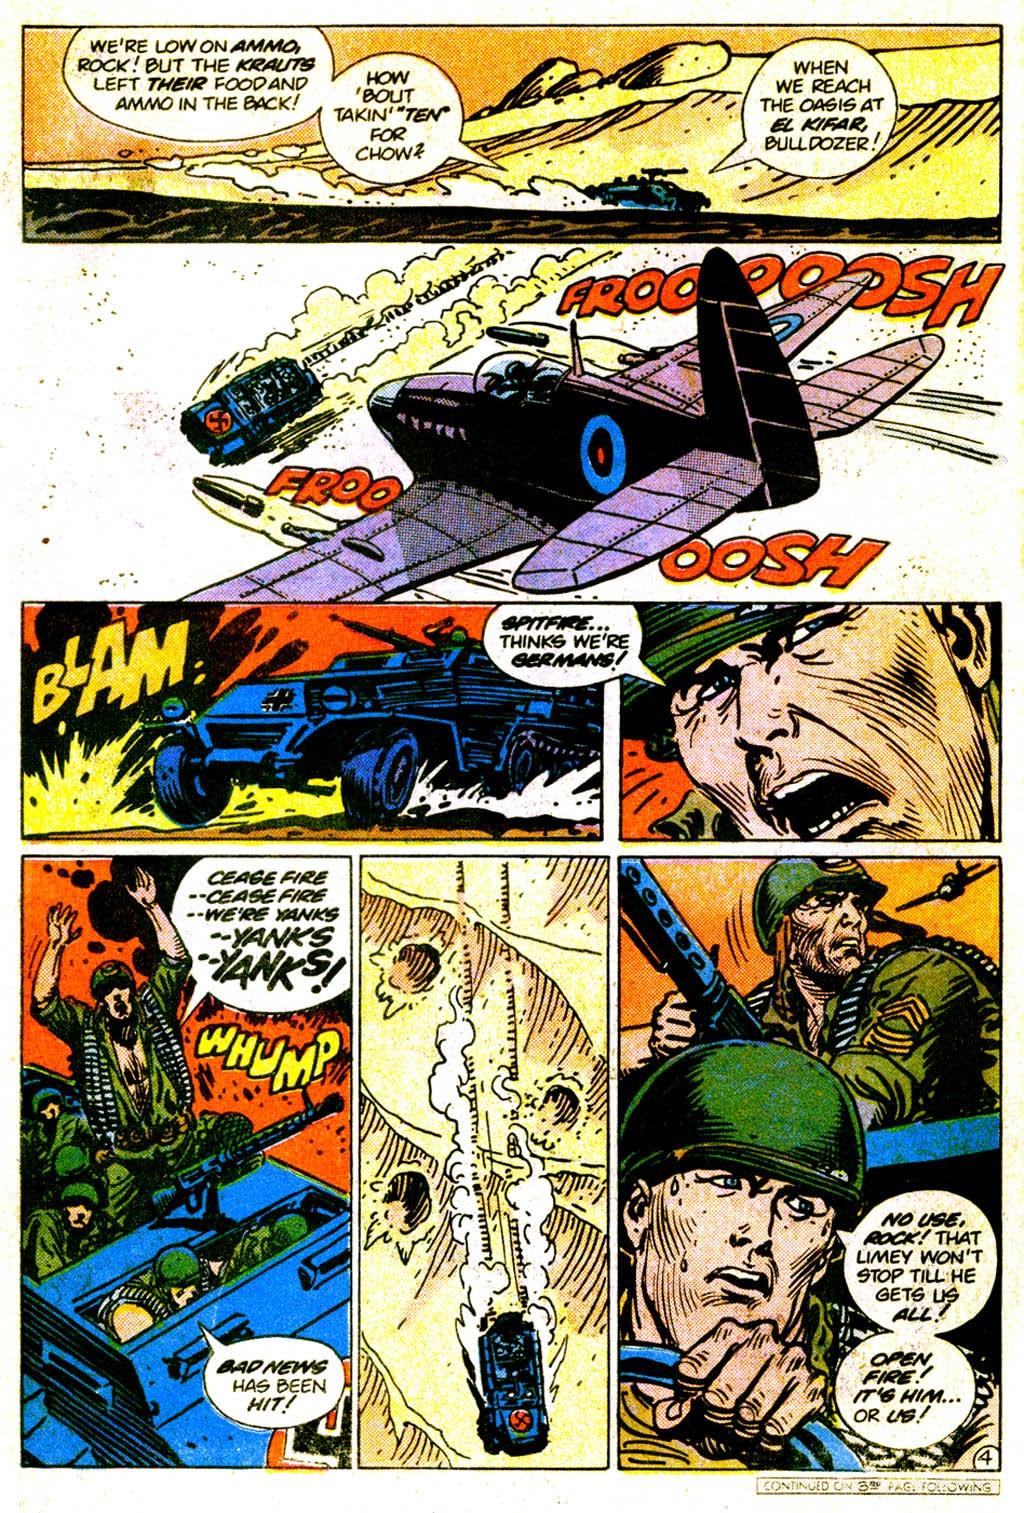 Read online Sgt. Rock comic -  Issue #373 - 5